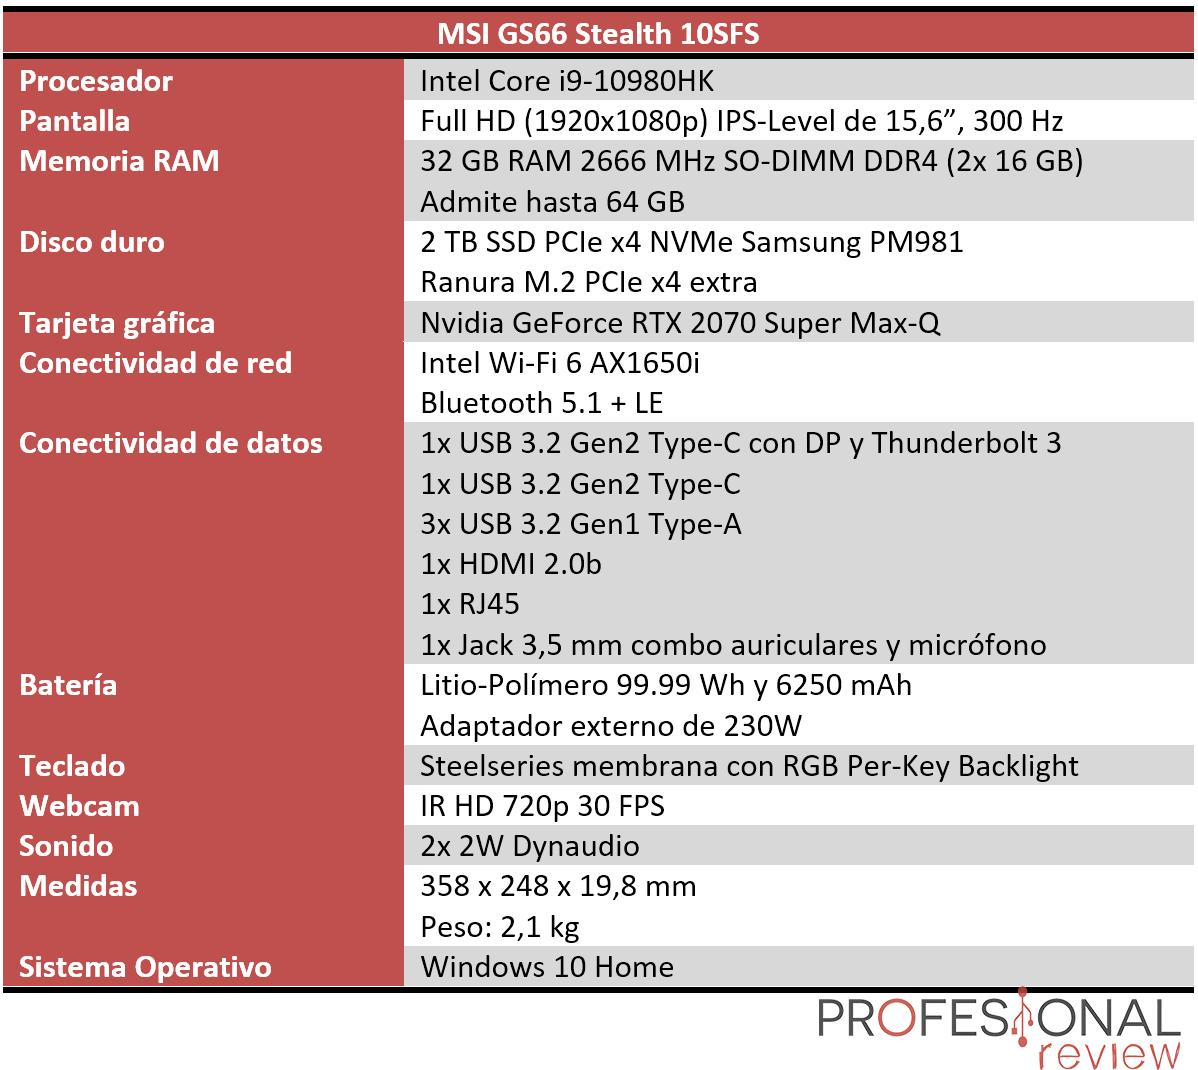 MSI GS66 Stealth 10SFS Caracteristicas